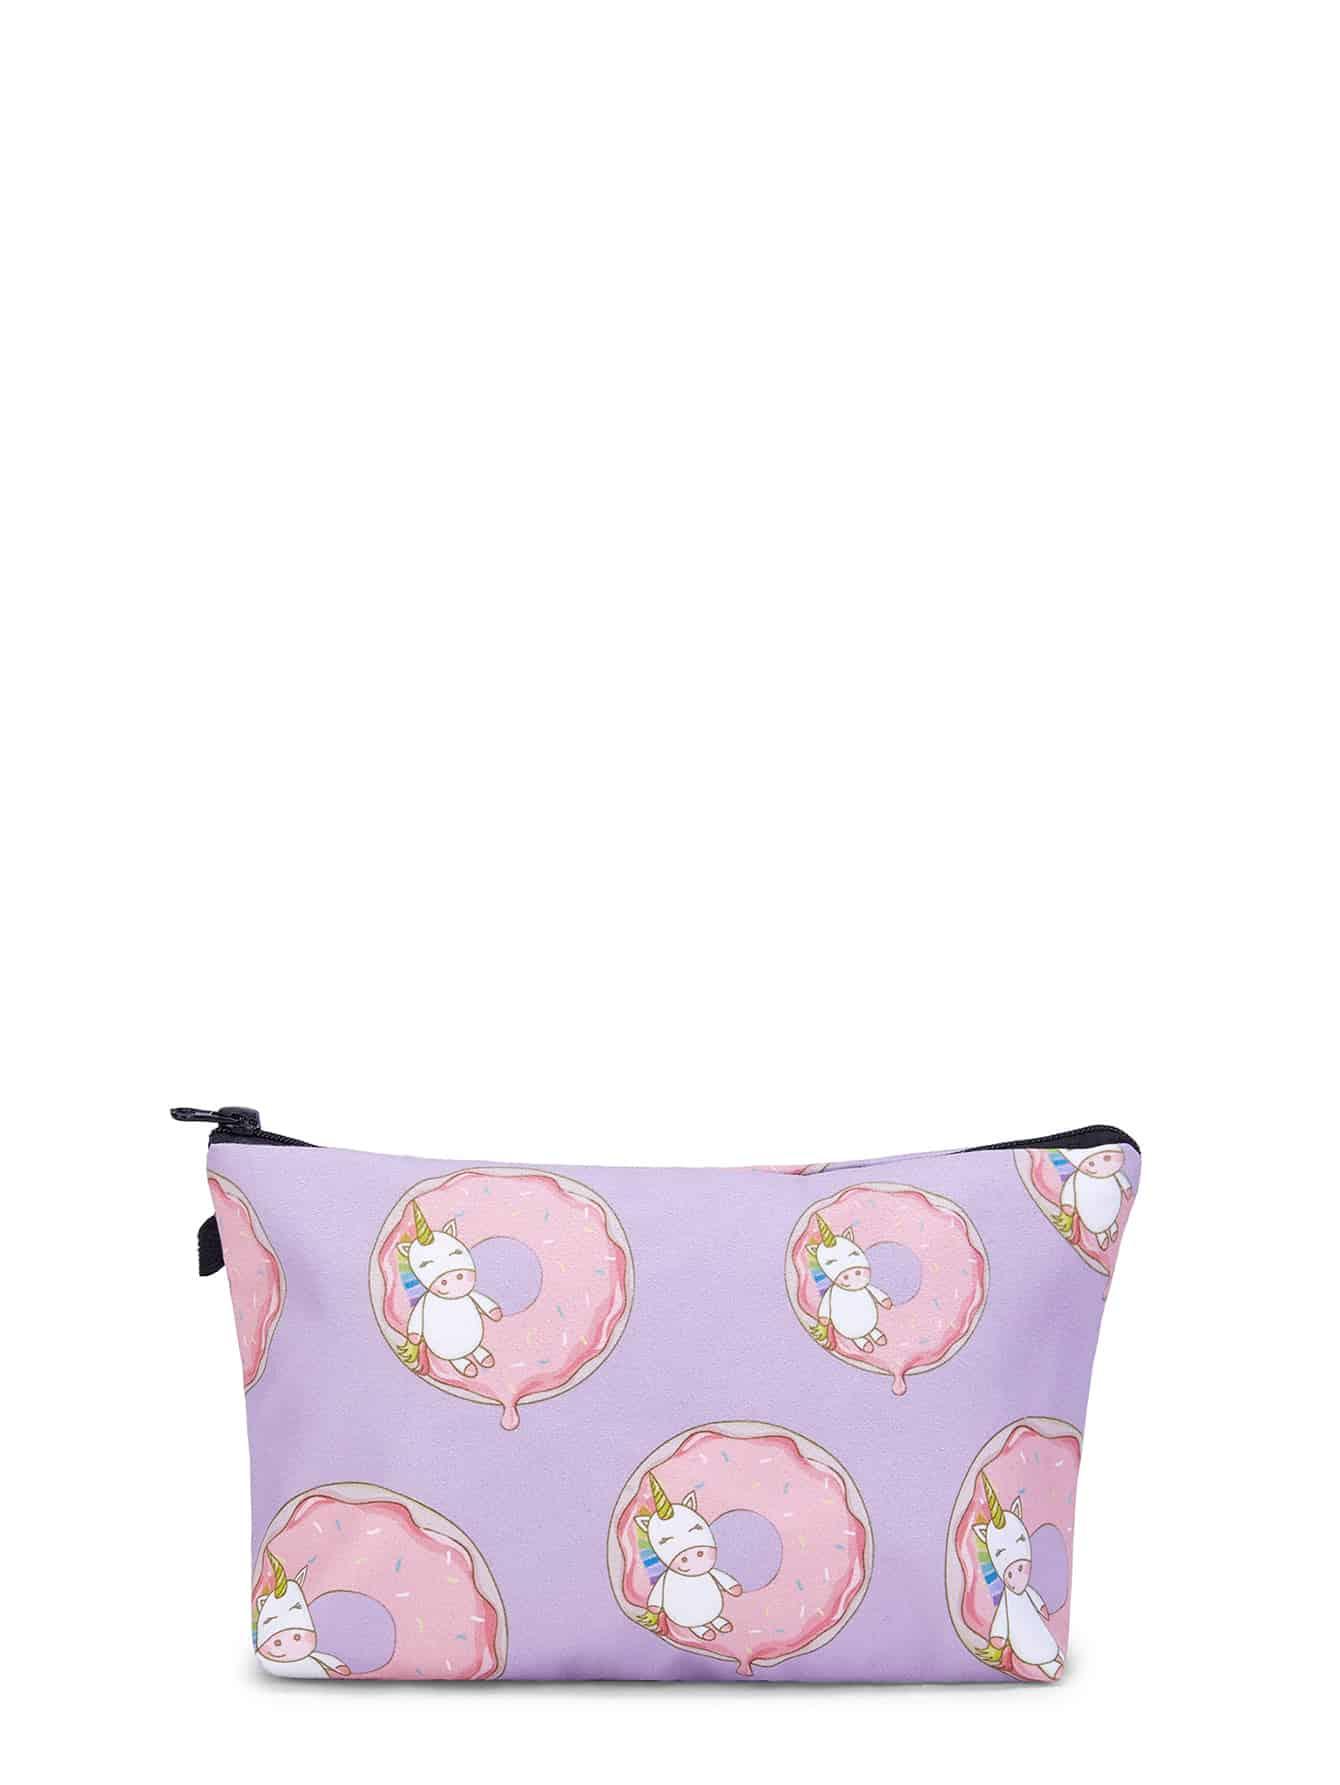 Unicorn & Doughnut Print Makeup Bag doughnut print pullover